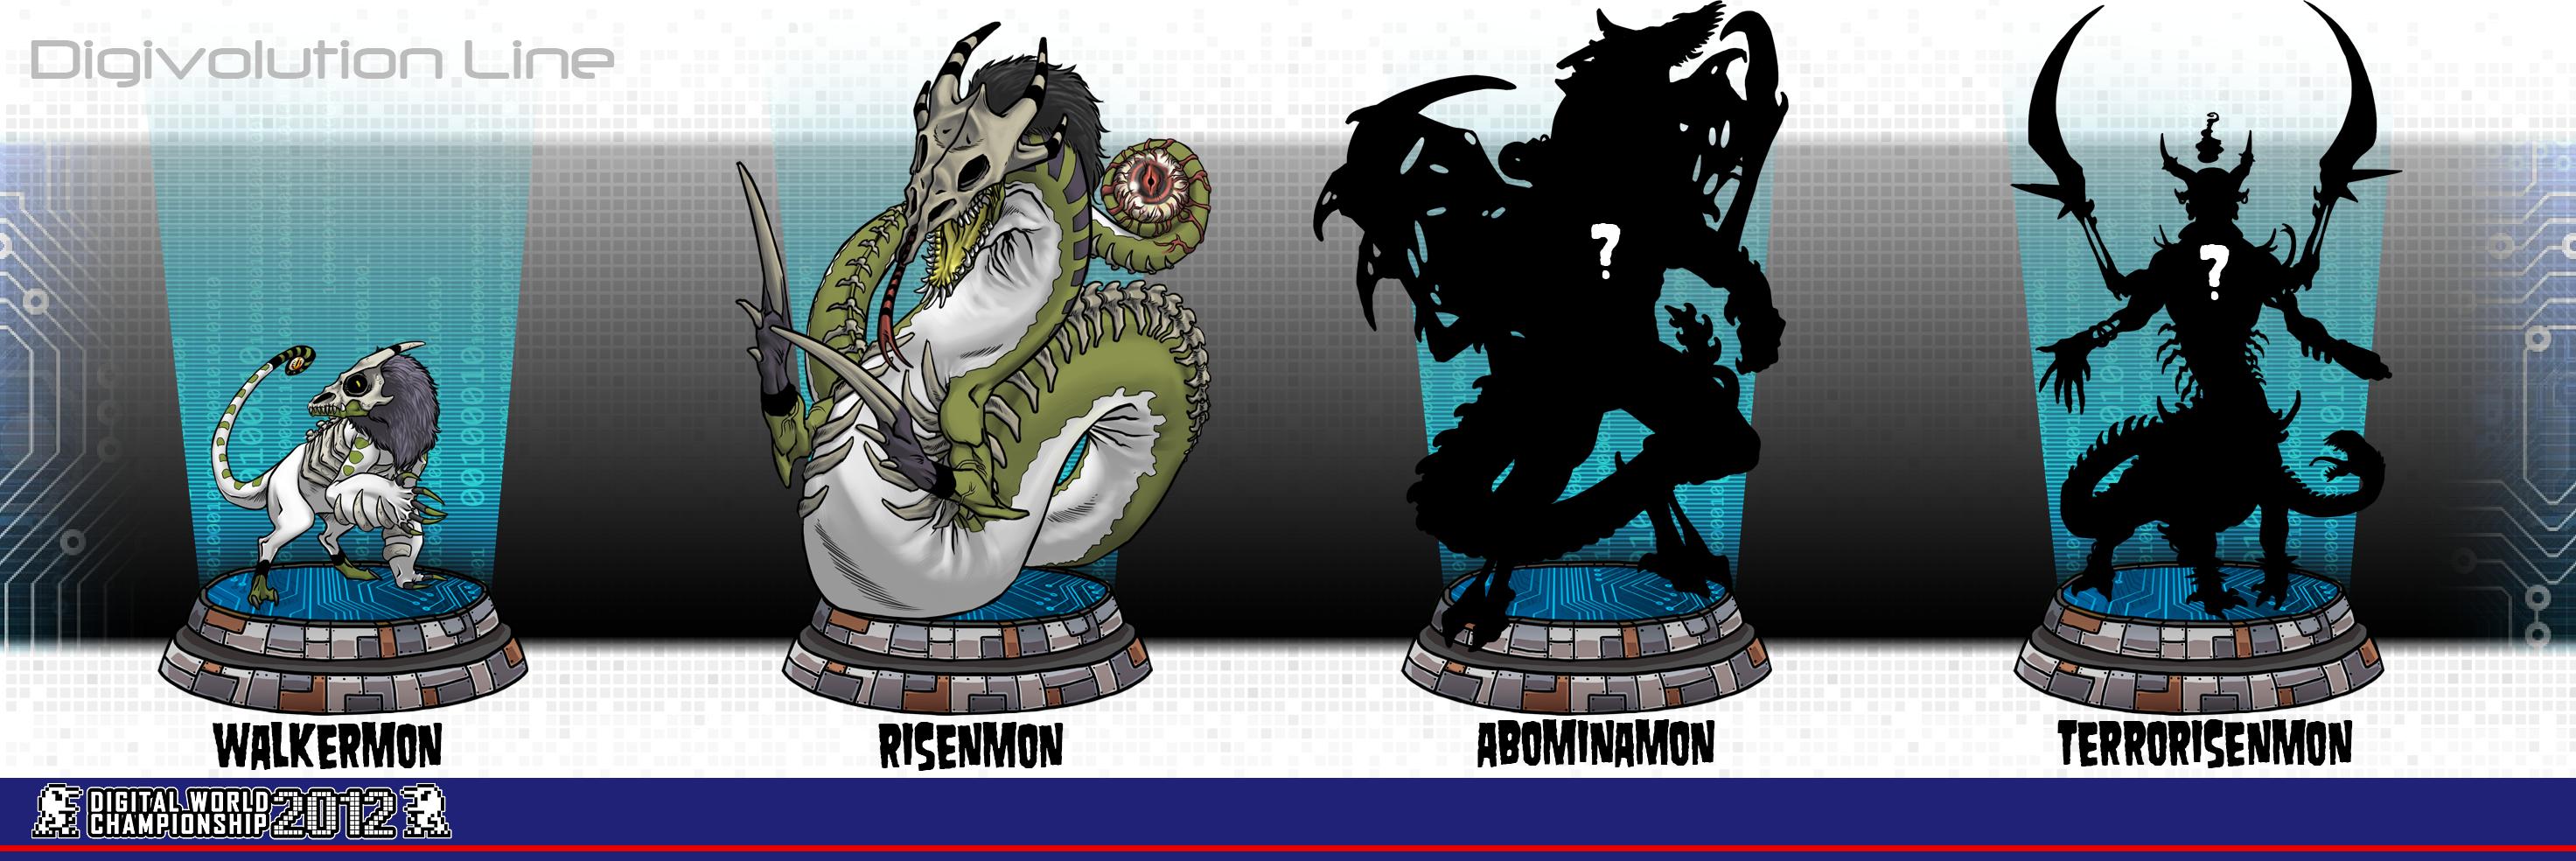 Digimon: Digivolution Line by InkyBrain